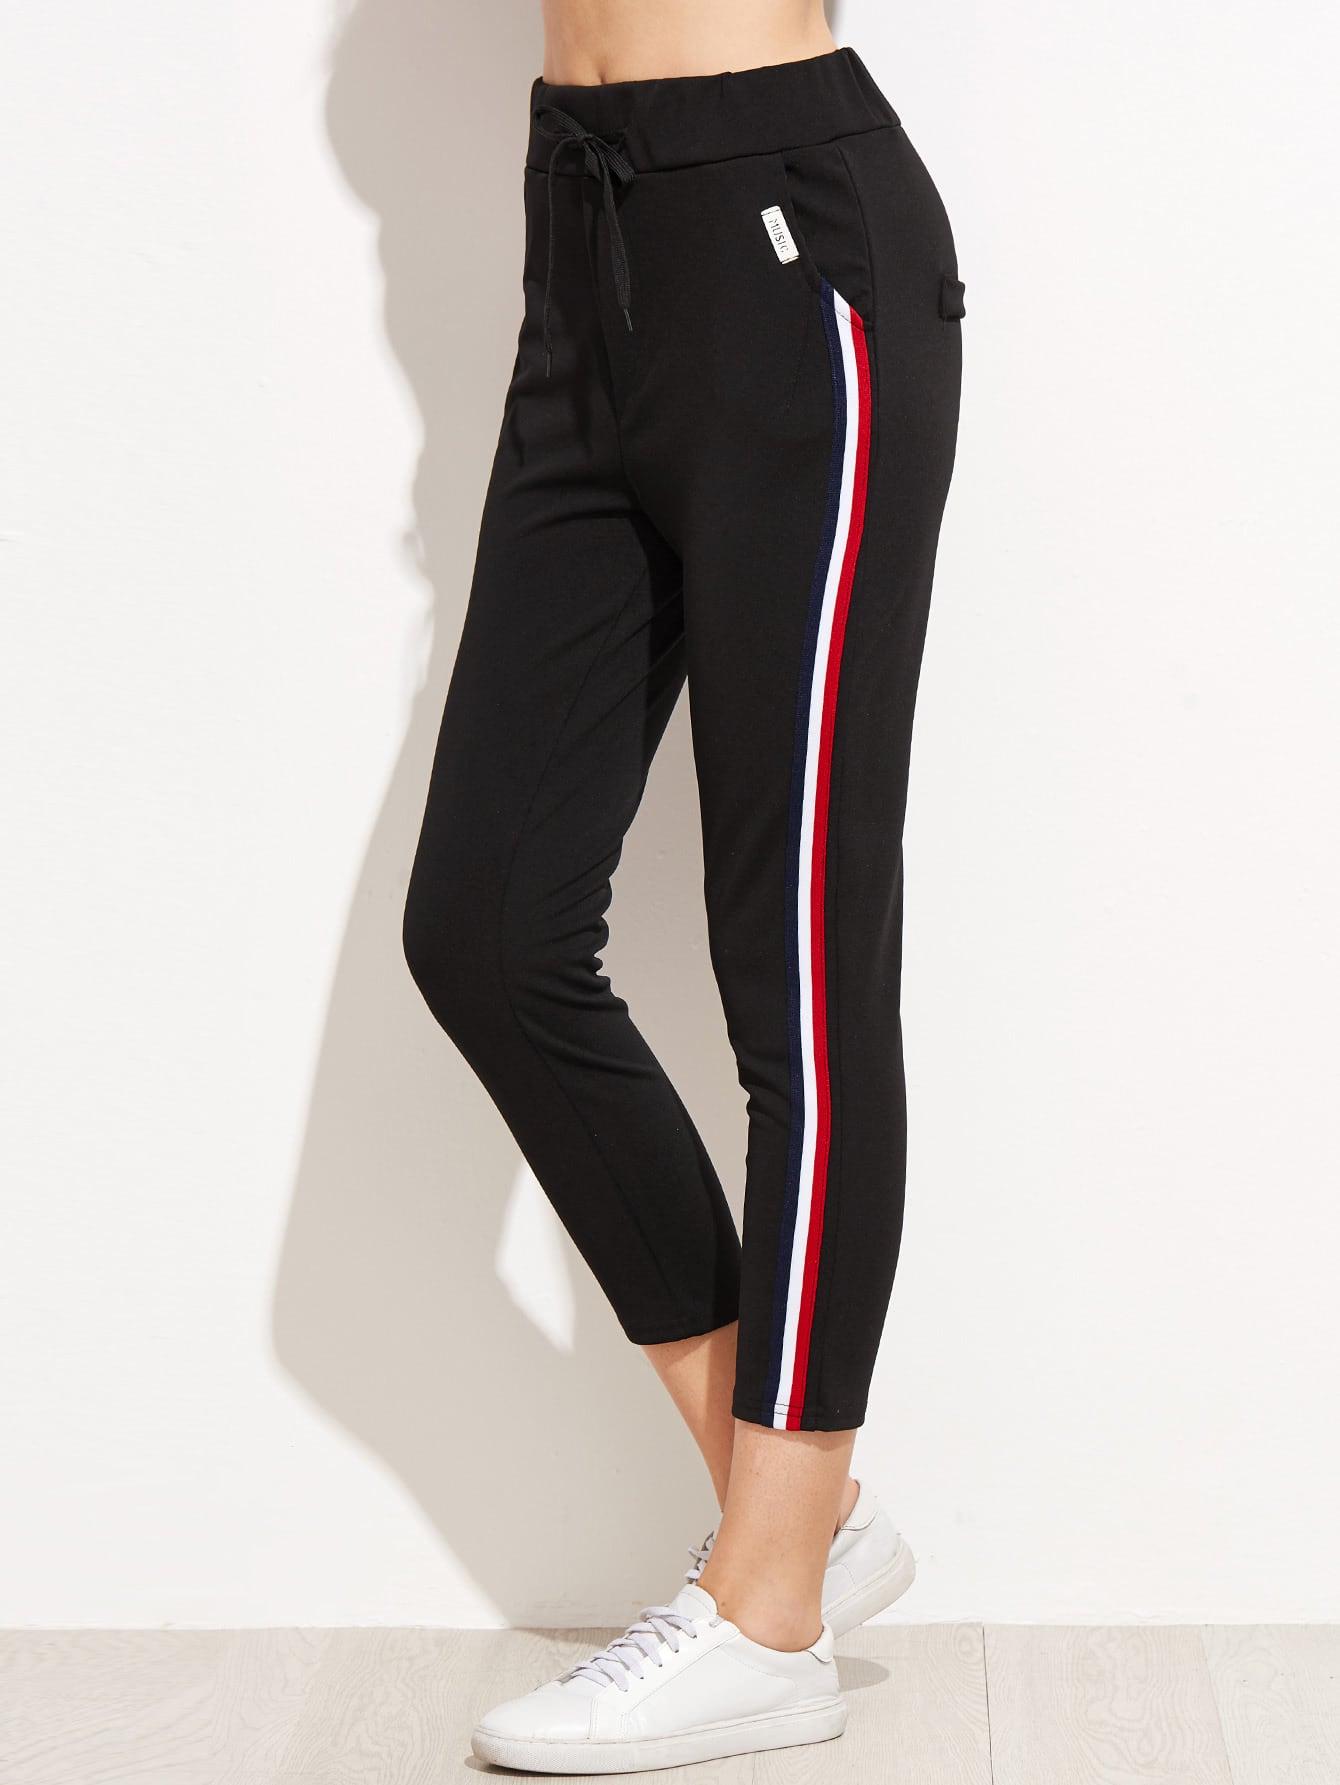 Black Striped Side Drawstring Pants Romwe